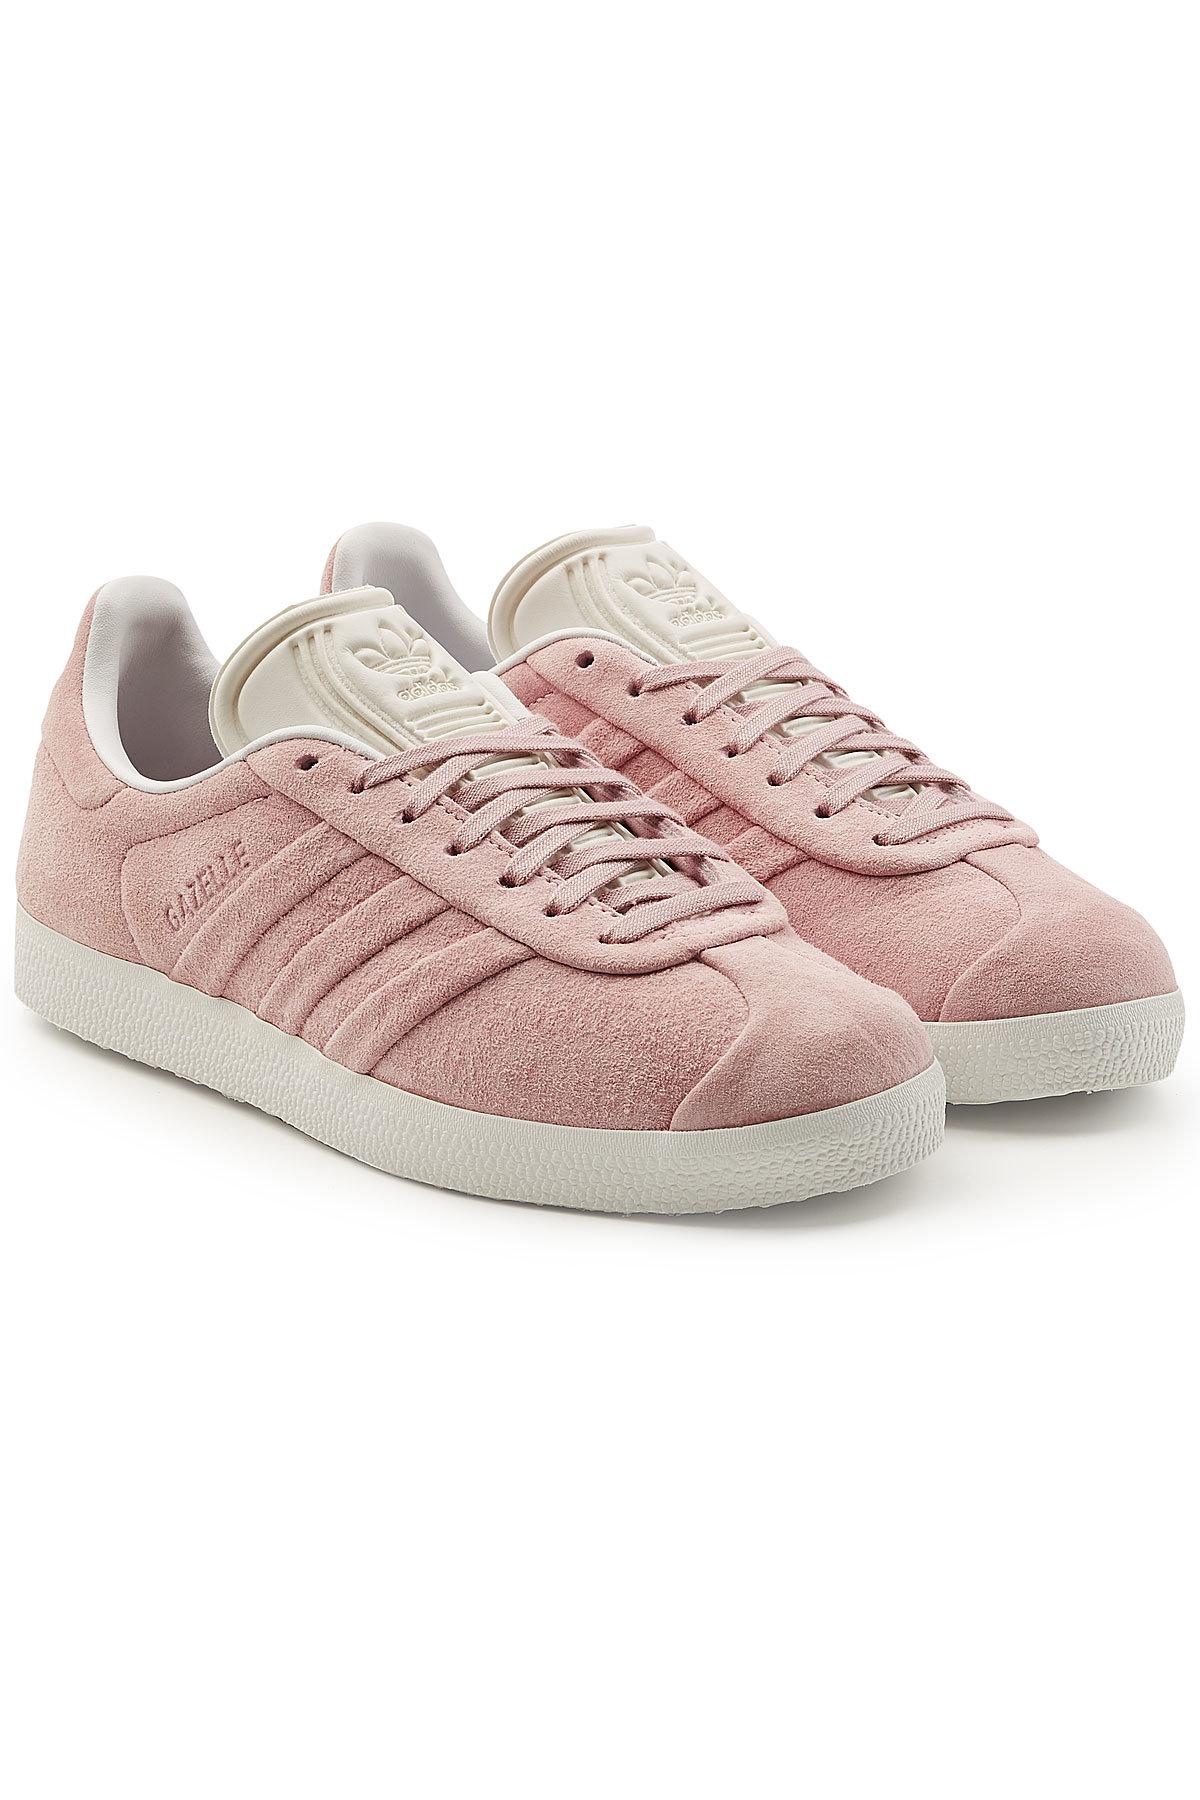 adidas Gazelle Stitch and Turn Suede Sneakers Gr. UK 8 LvxzoFXR